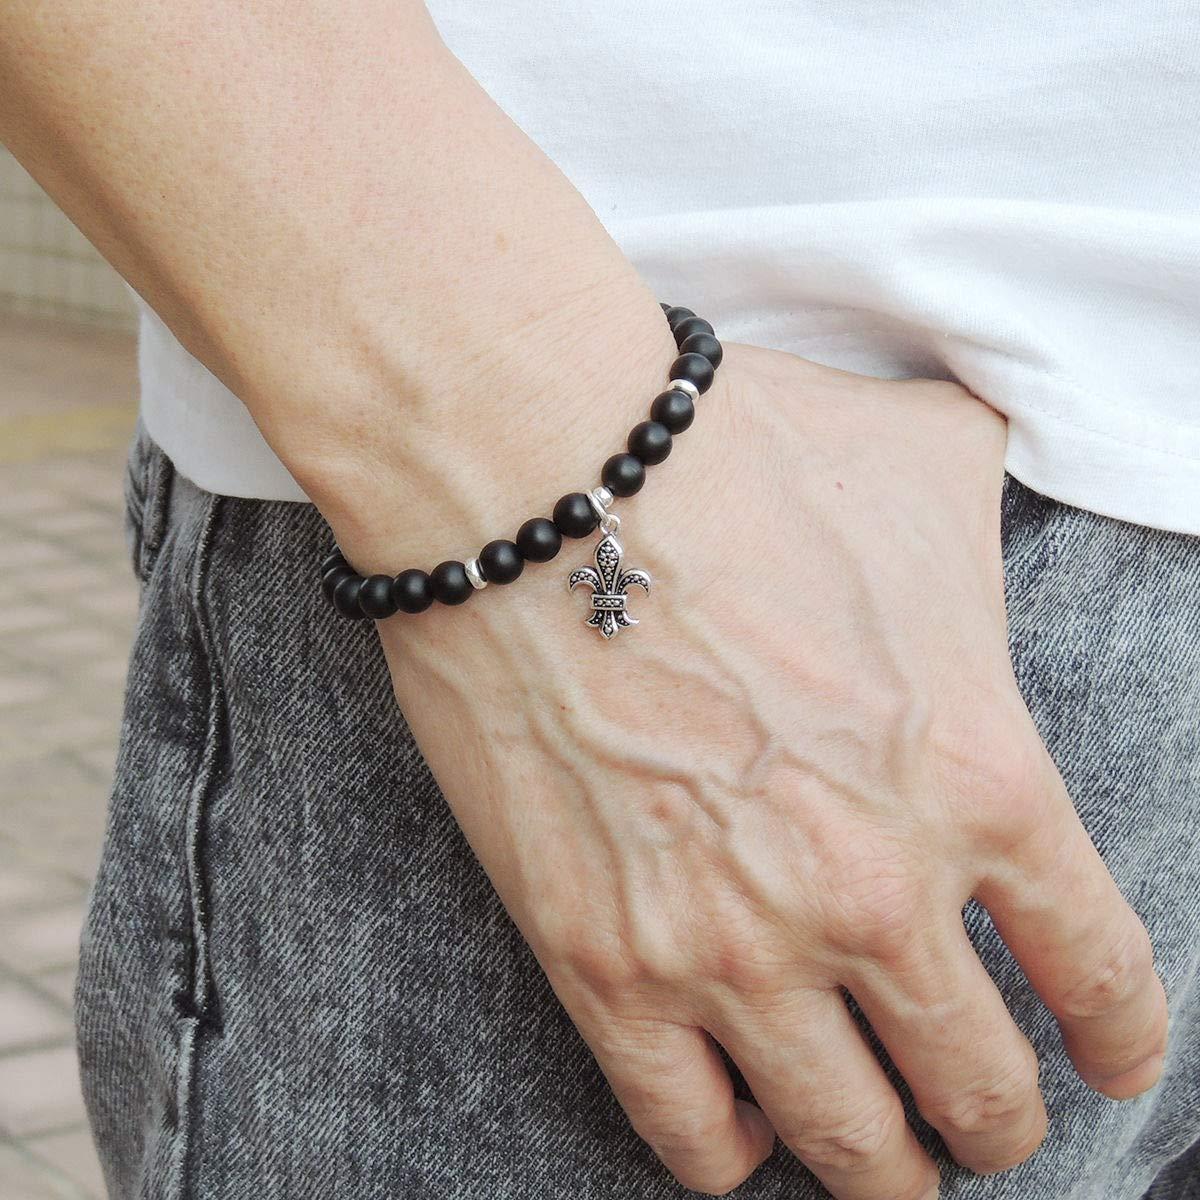 Matte Black Onyx Sterling Silver Bracelet Mens Women Fleur de Lis DIY-KAREN 520